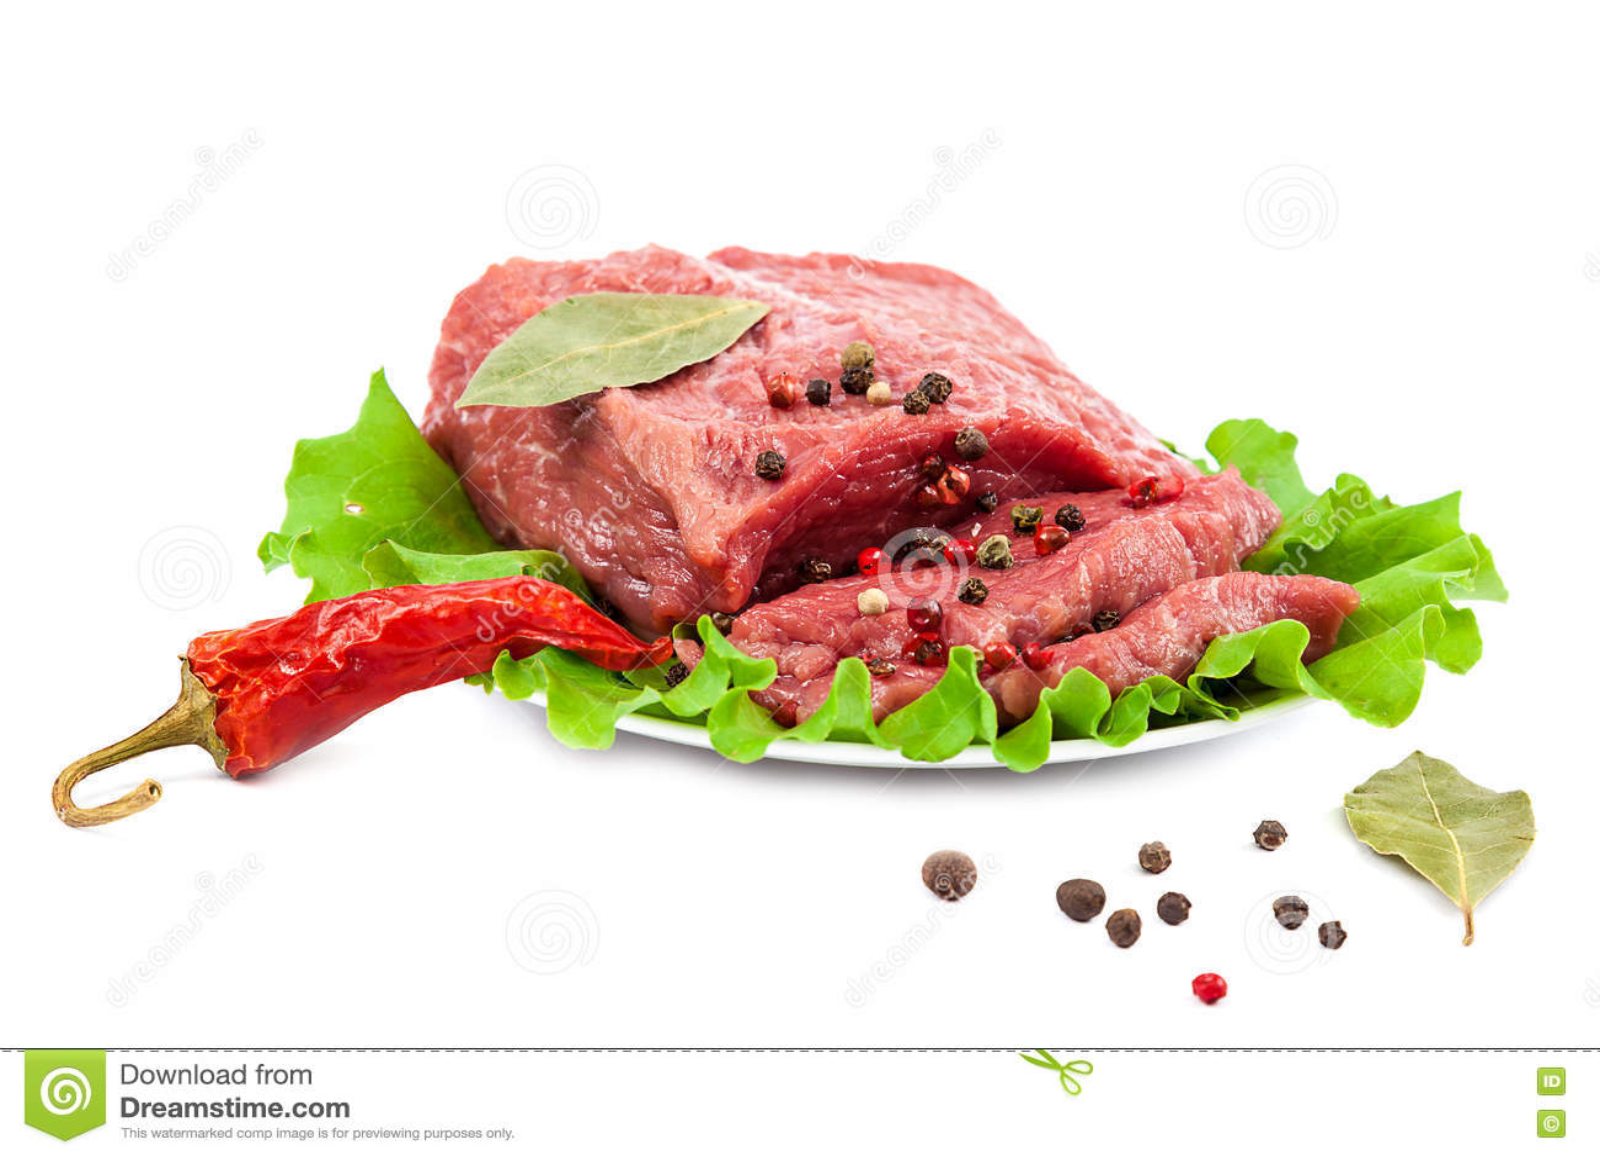 Carne cruda fresca su un fondo bianco